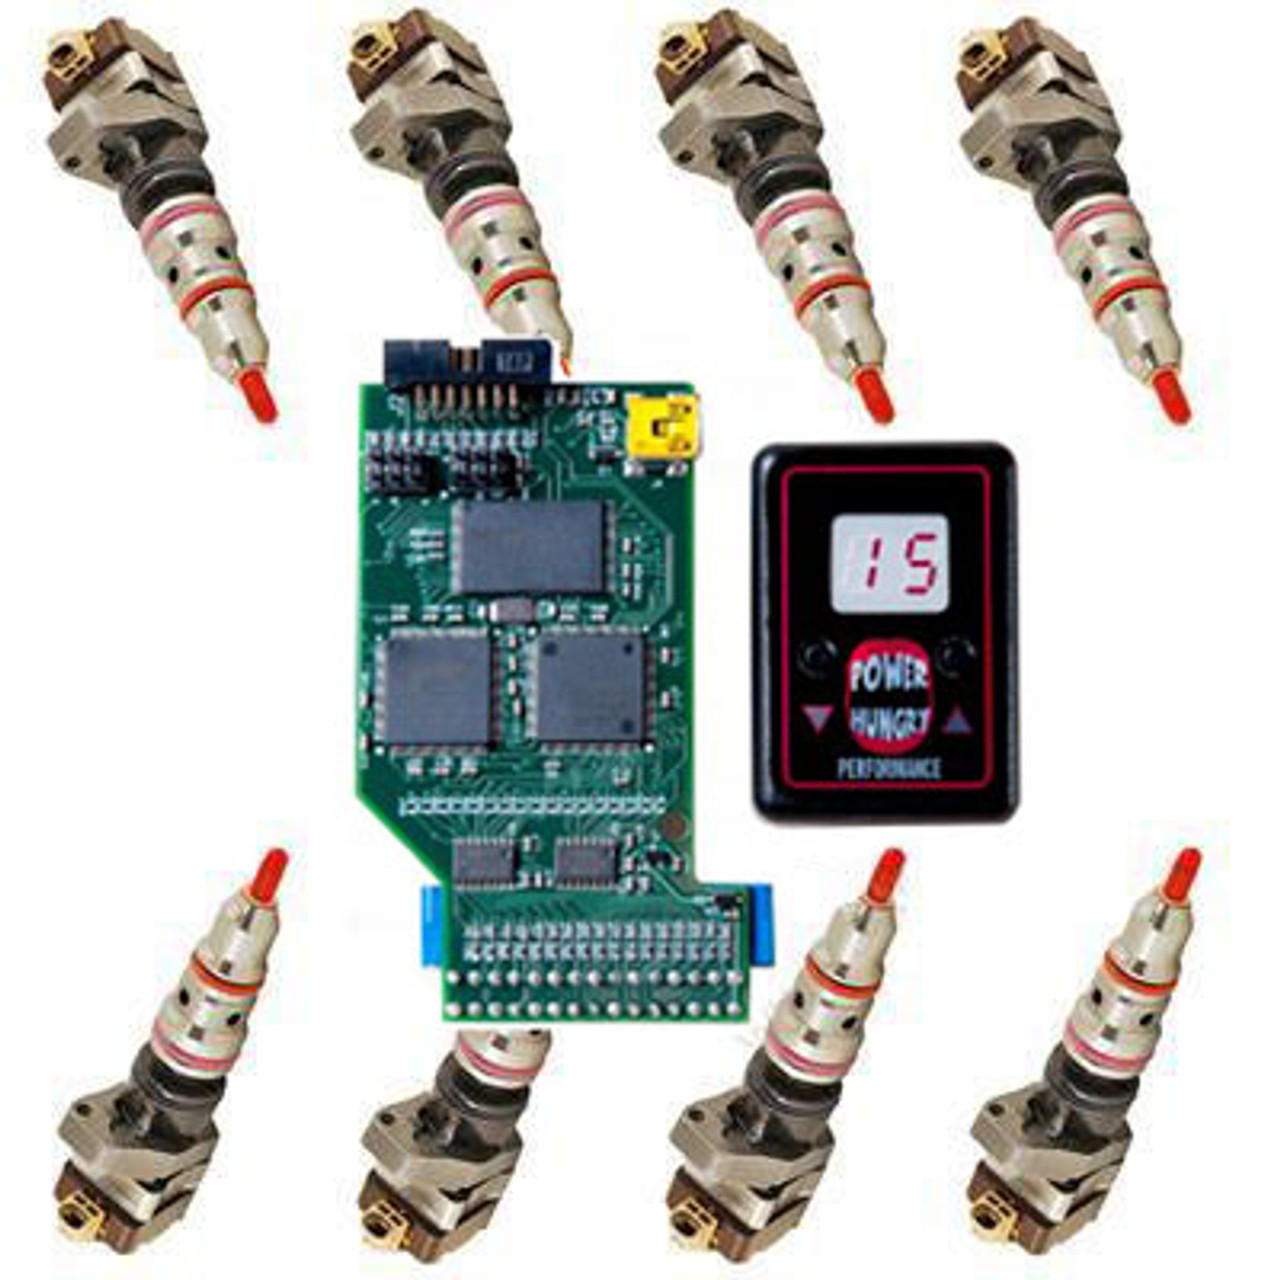 hight resolution of injectorhydra 87340 1432244224 jpg c 2 imbypass on